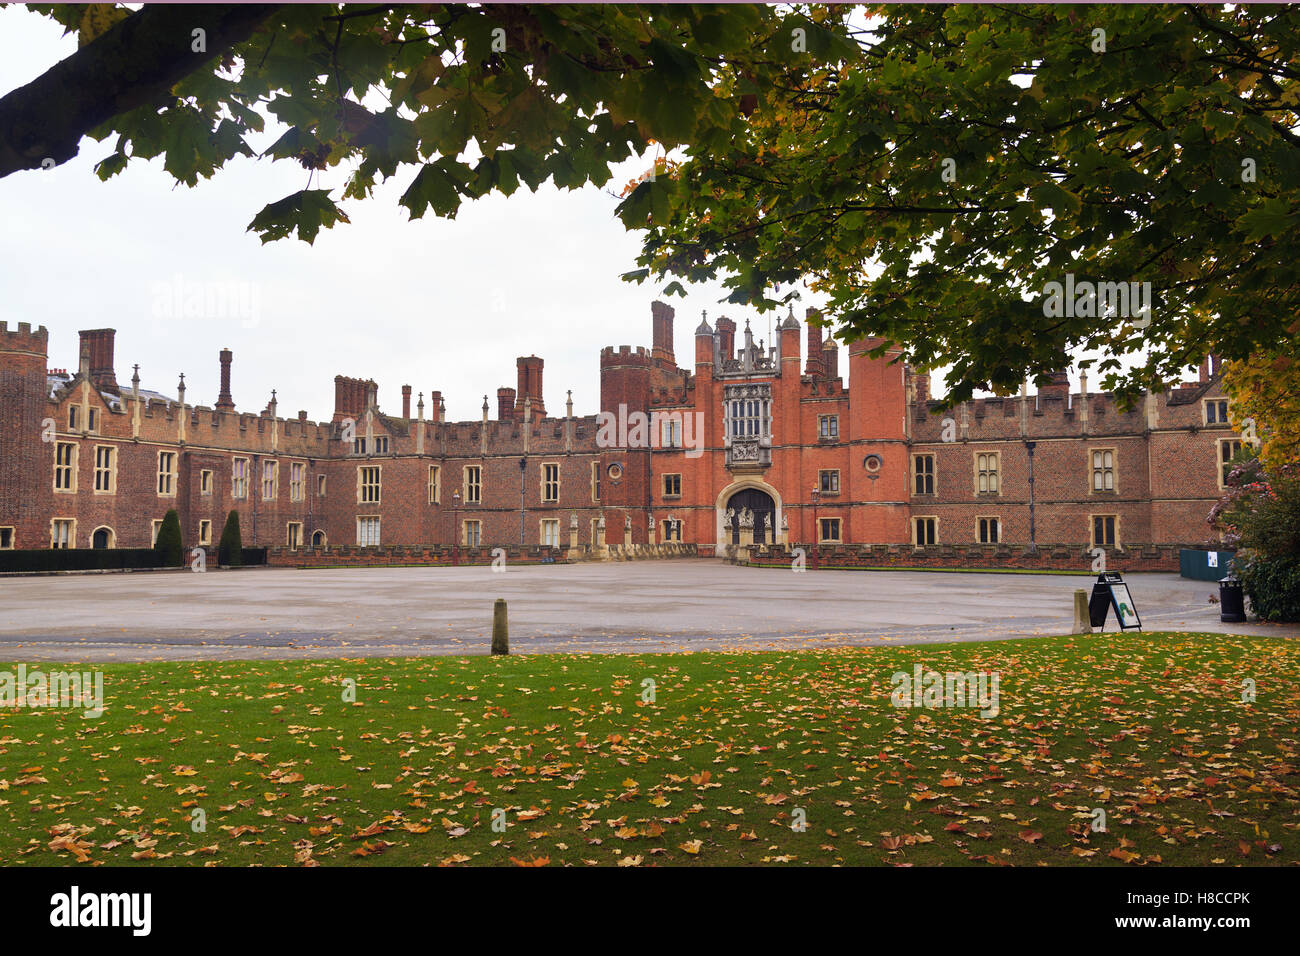 Hampton Court Palace Frontage - Stock Image